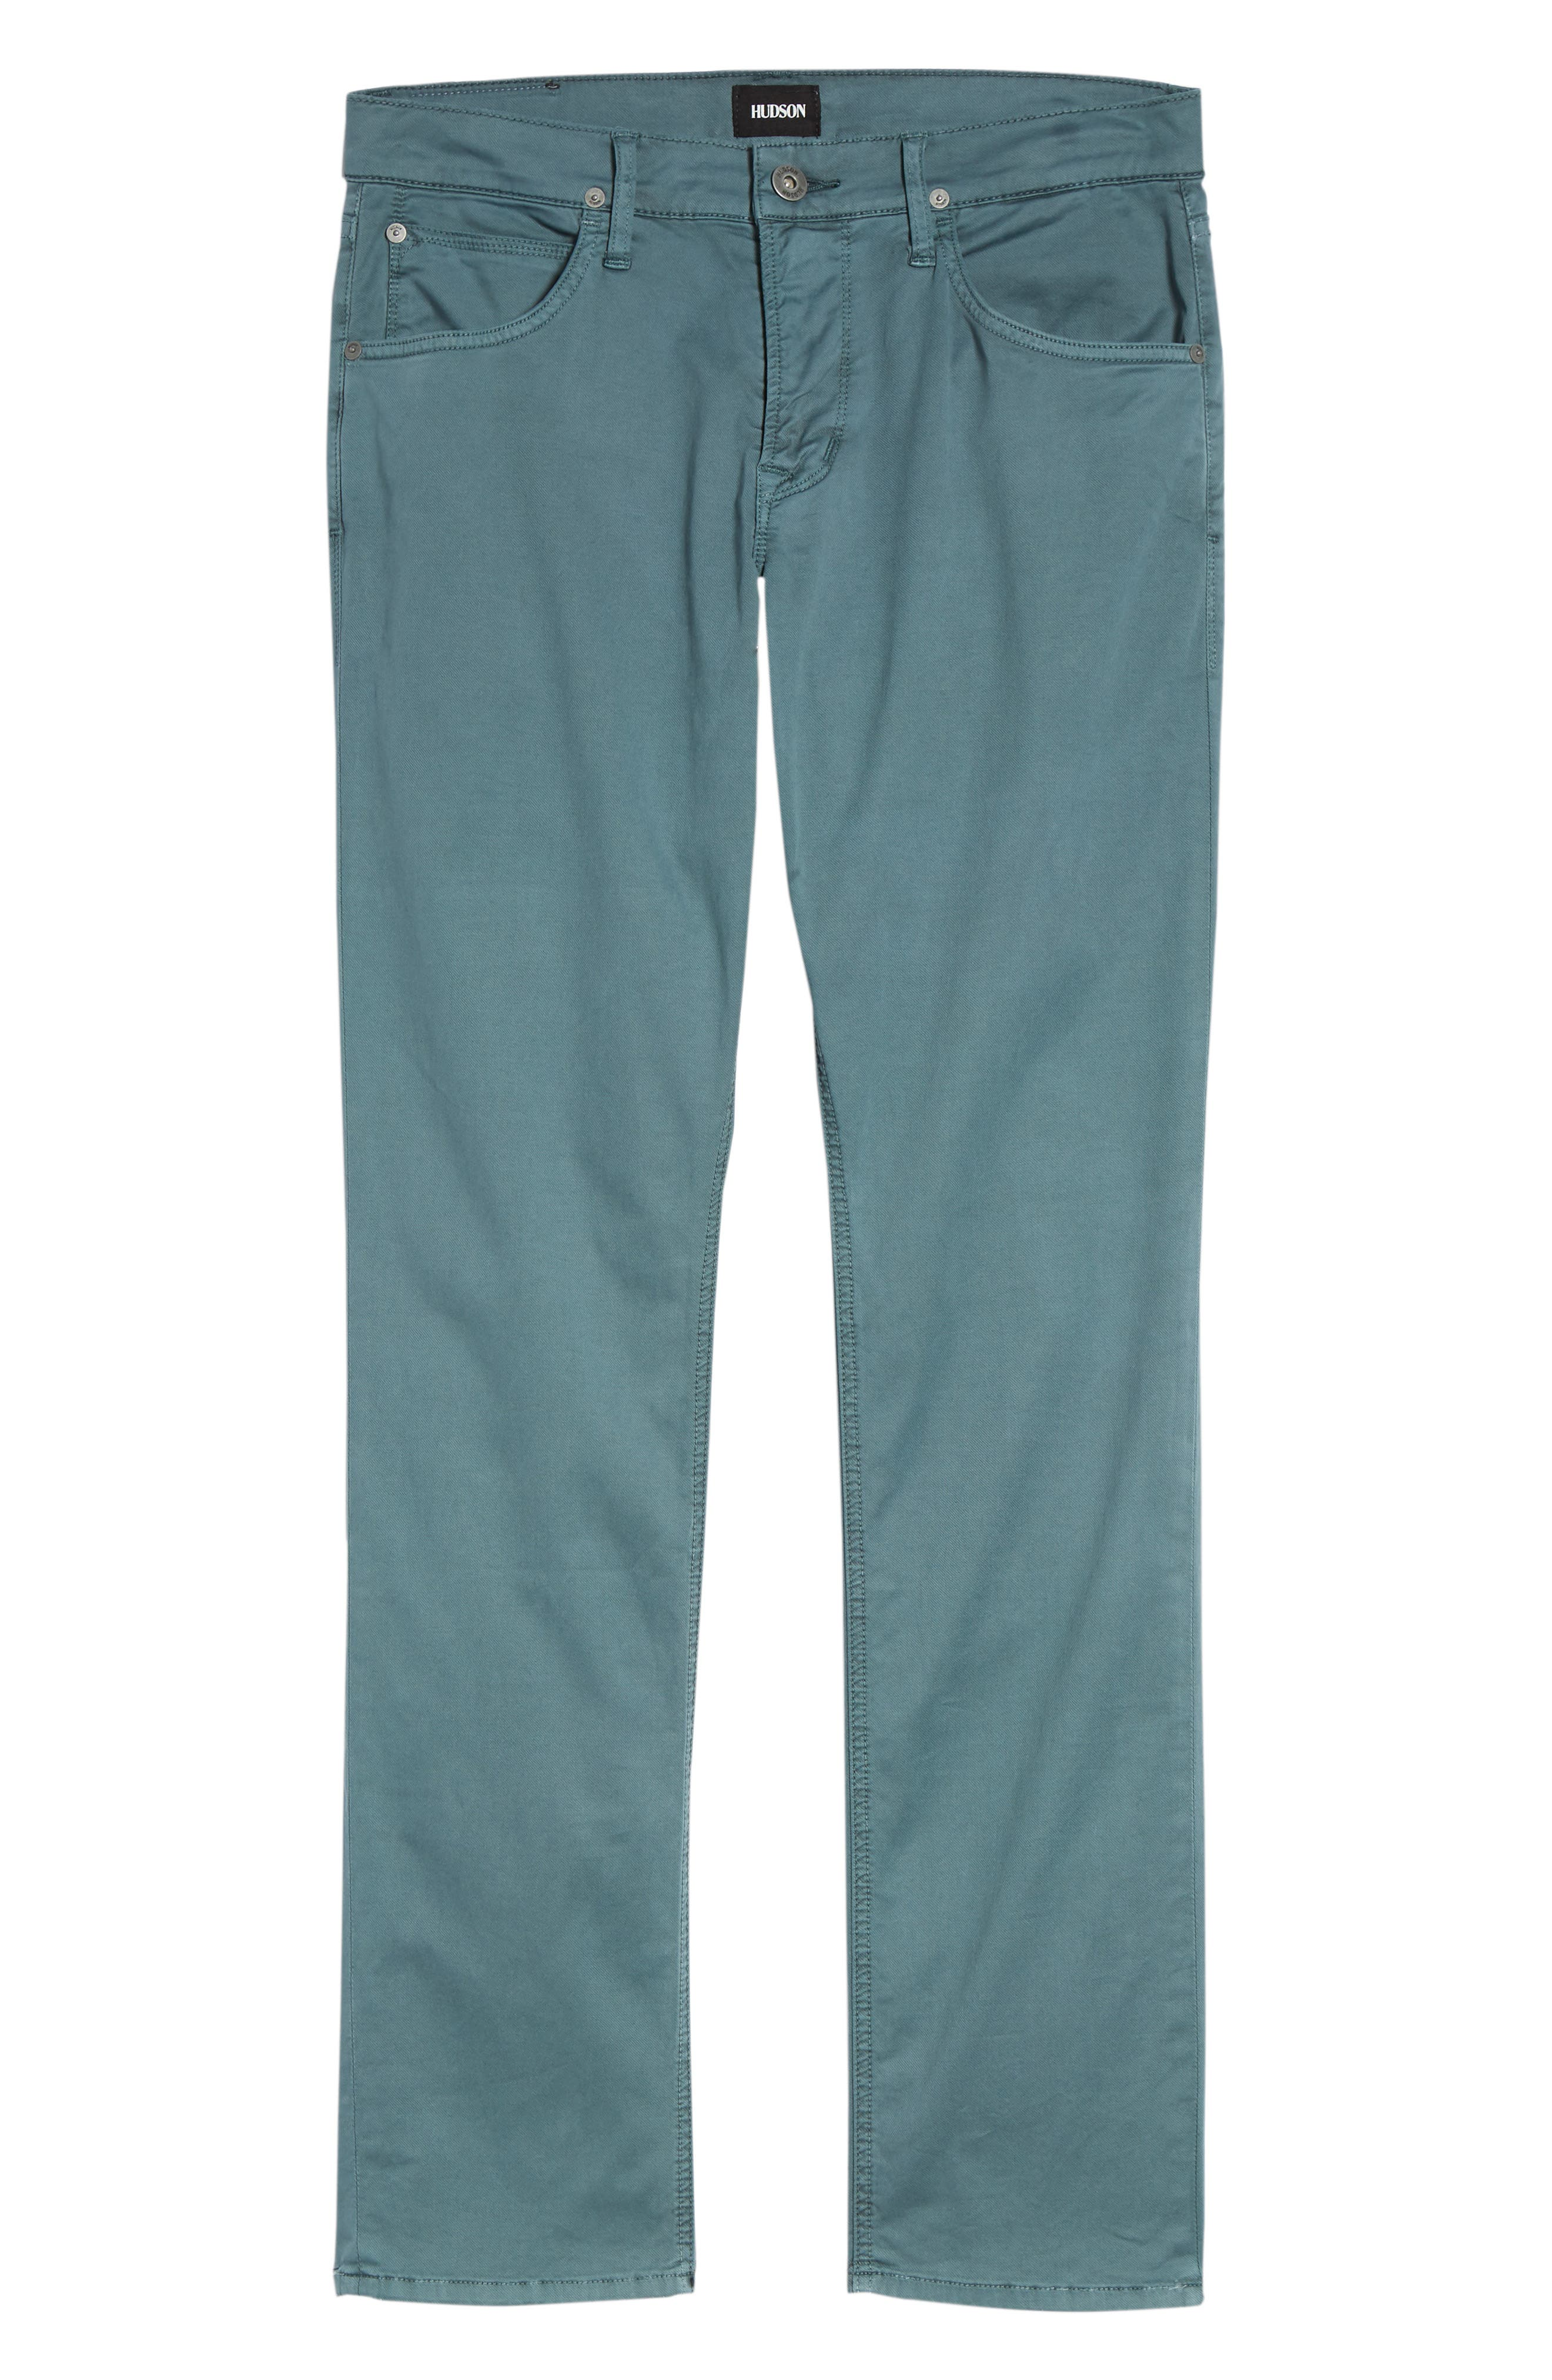 Blake Slim Fit Jeans,                             Alternate thumbnail 6, color,                             497